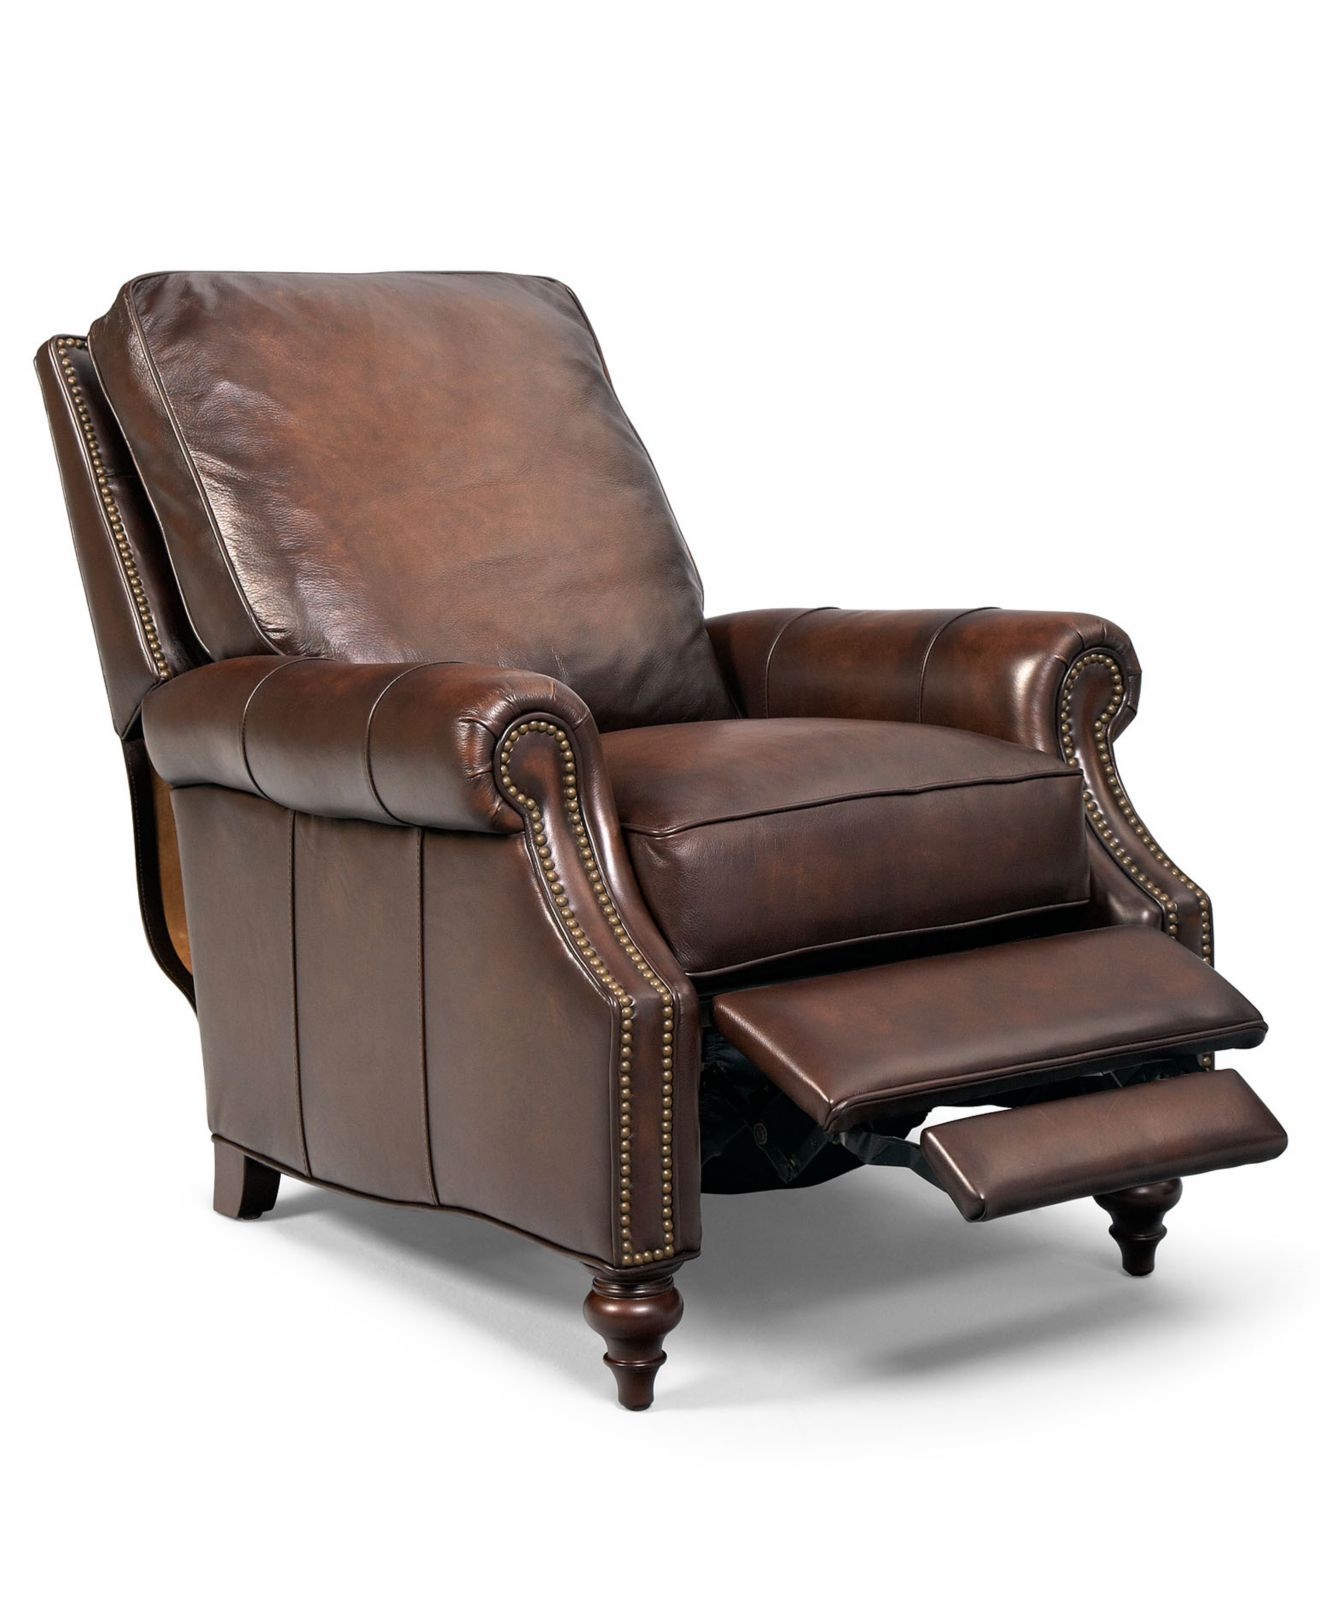 sofasandmore defensor sporting ca boston river sofascore madigan leather recliner chair 32 75 quotw x 38 5 quotd 39 quoth